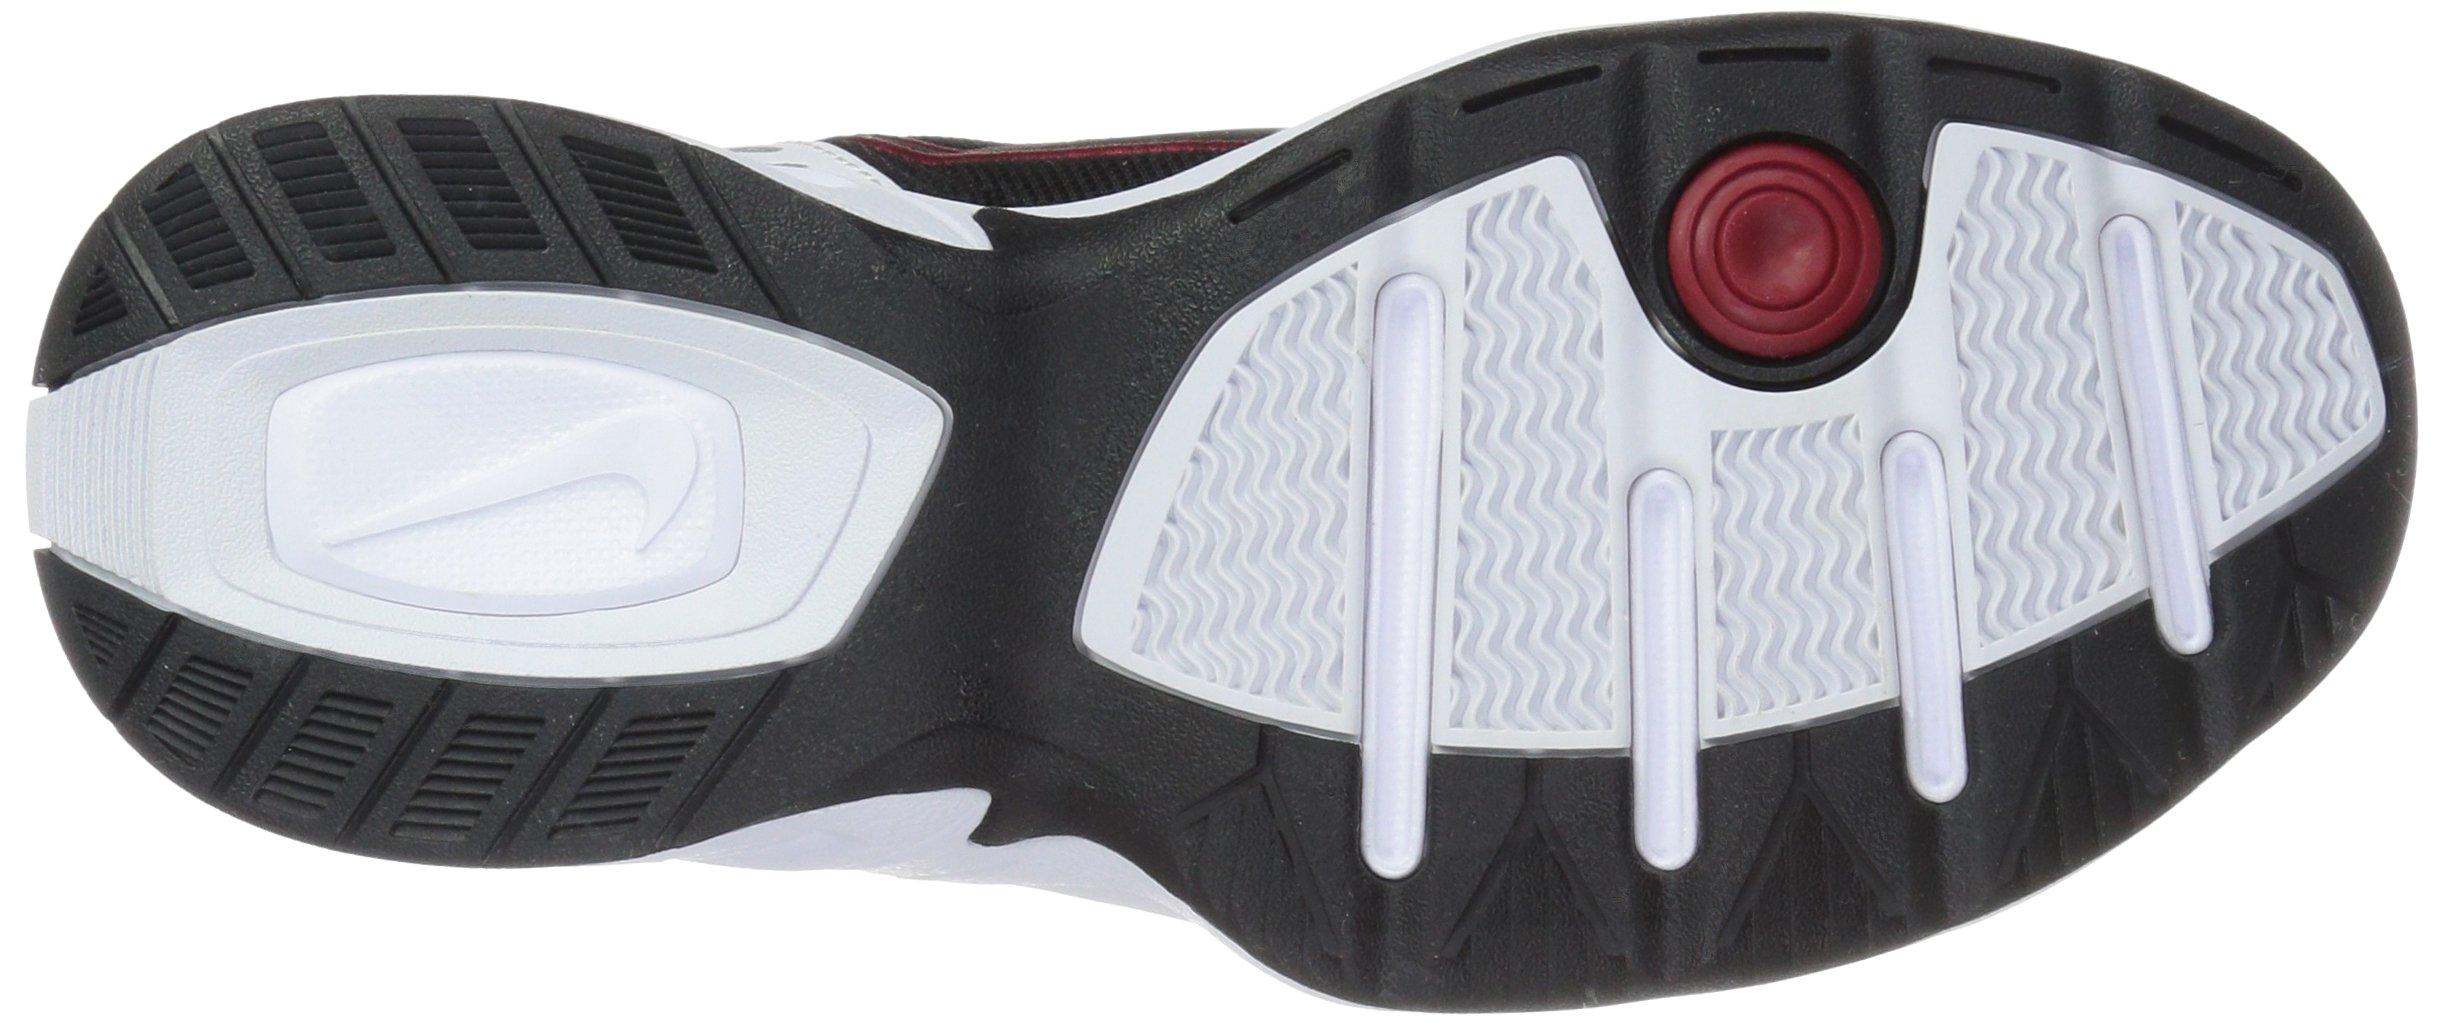 Nike-Men-039-s-Air-Monarch-IV-Cross-Trainer-Sneaker-416355 thumbnail 13